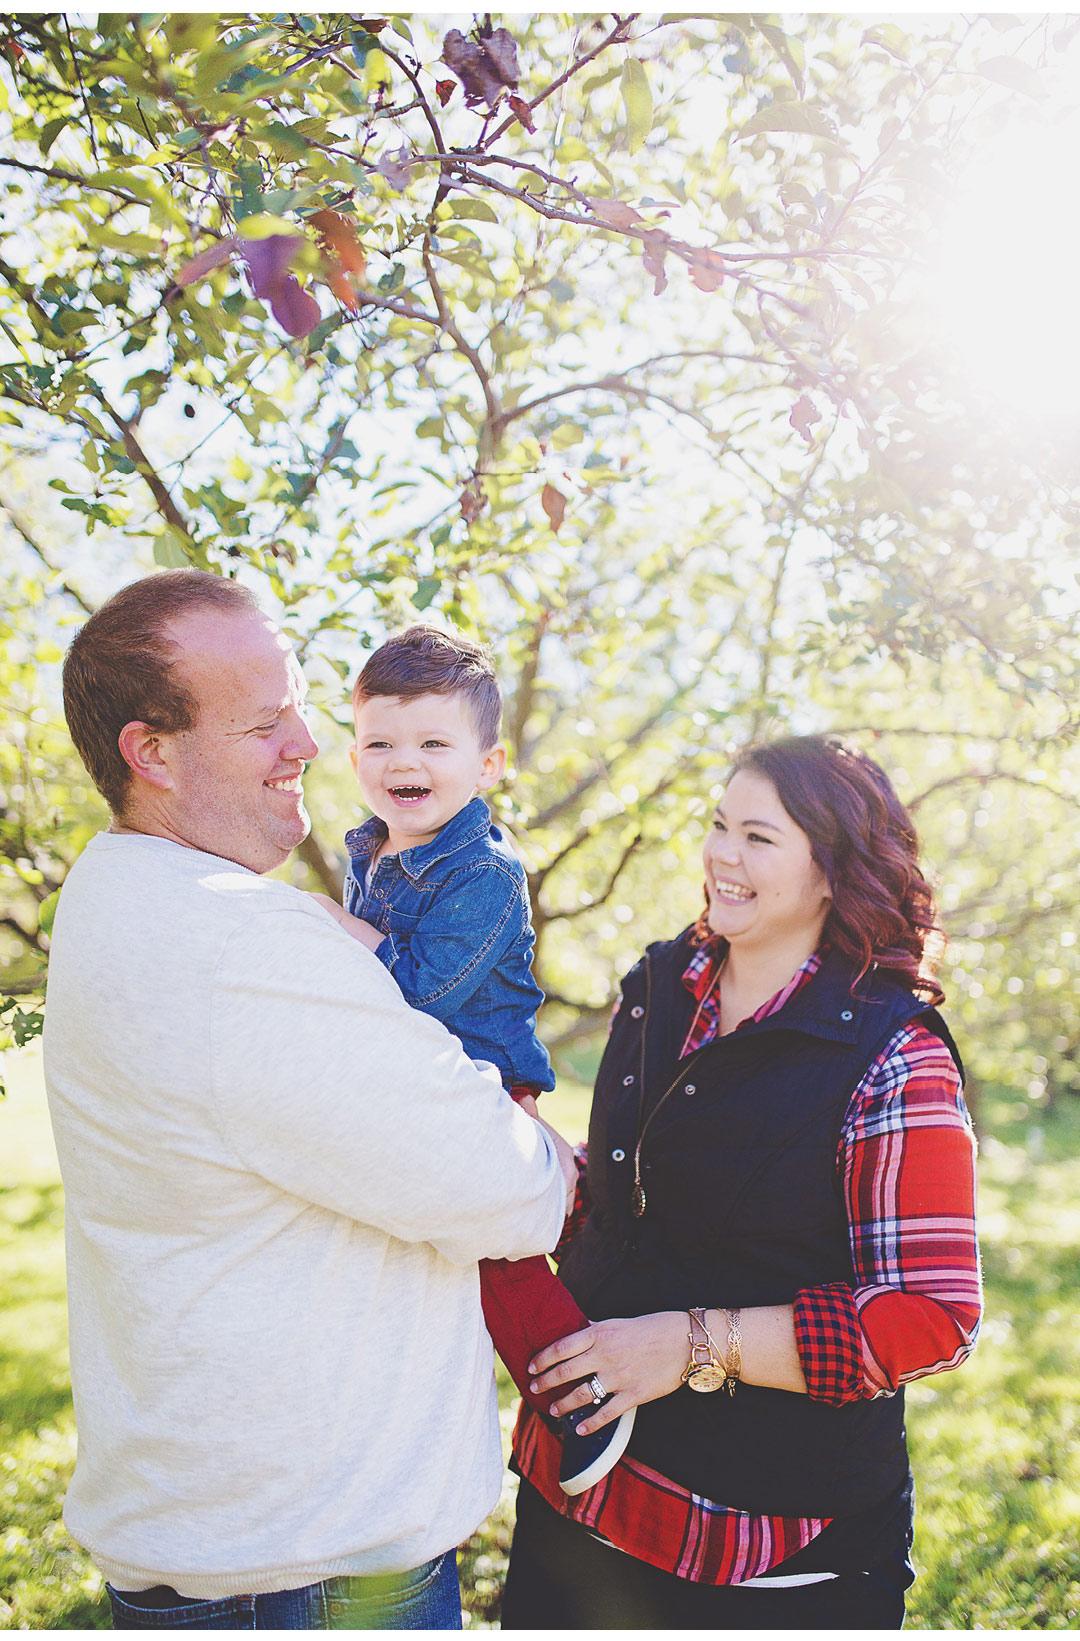 todd-2015-dayton-family-photography-.jpg